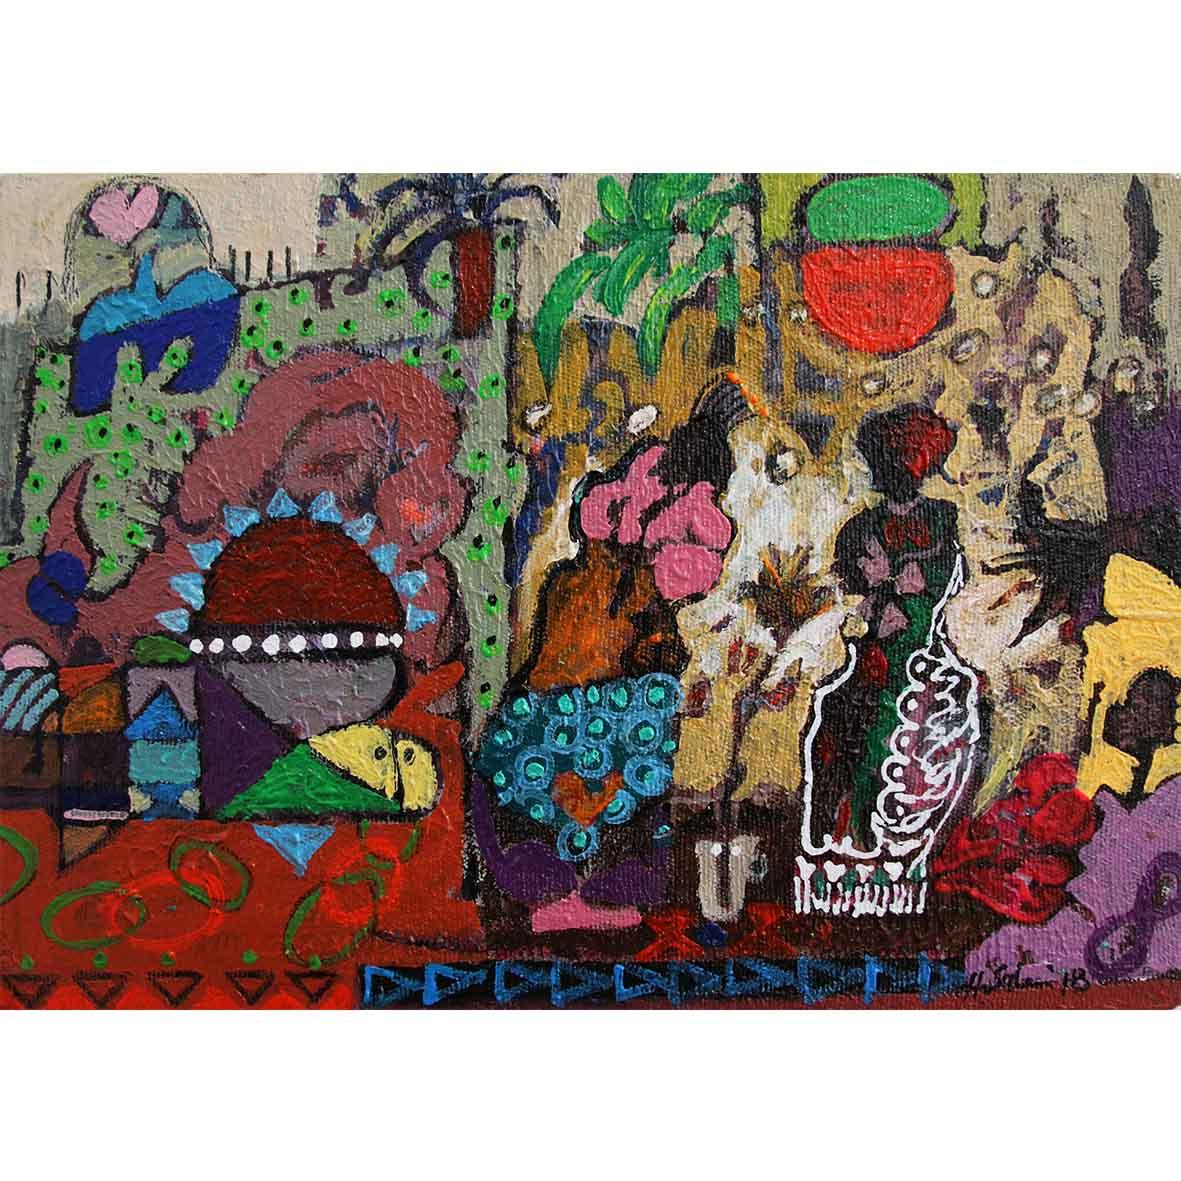 Hussein Salim Untitled (HS195) 2018 Acrylic on Canvas 19 x 27 cm